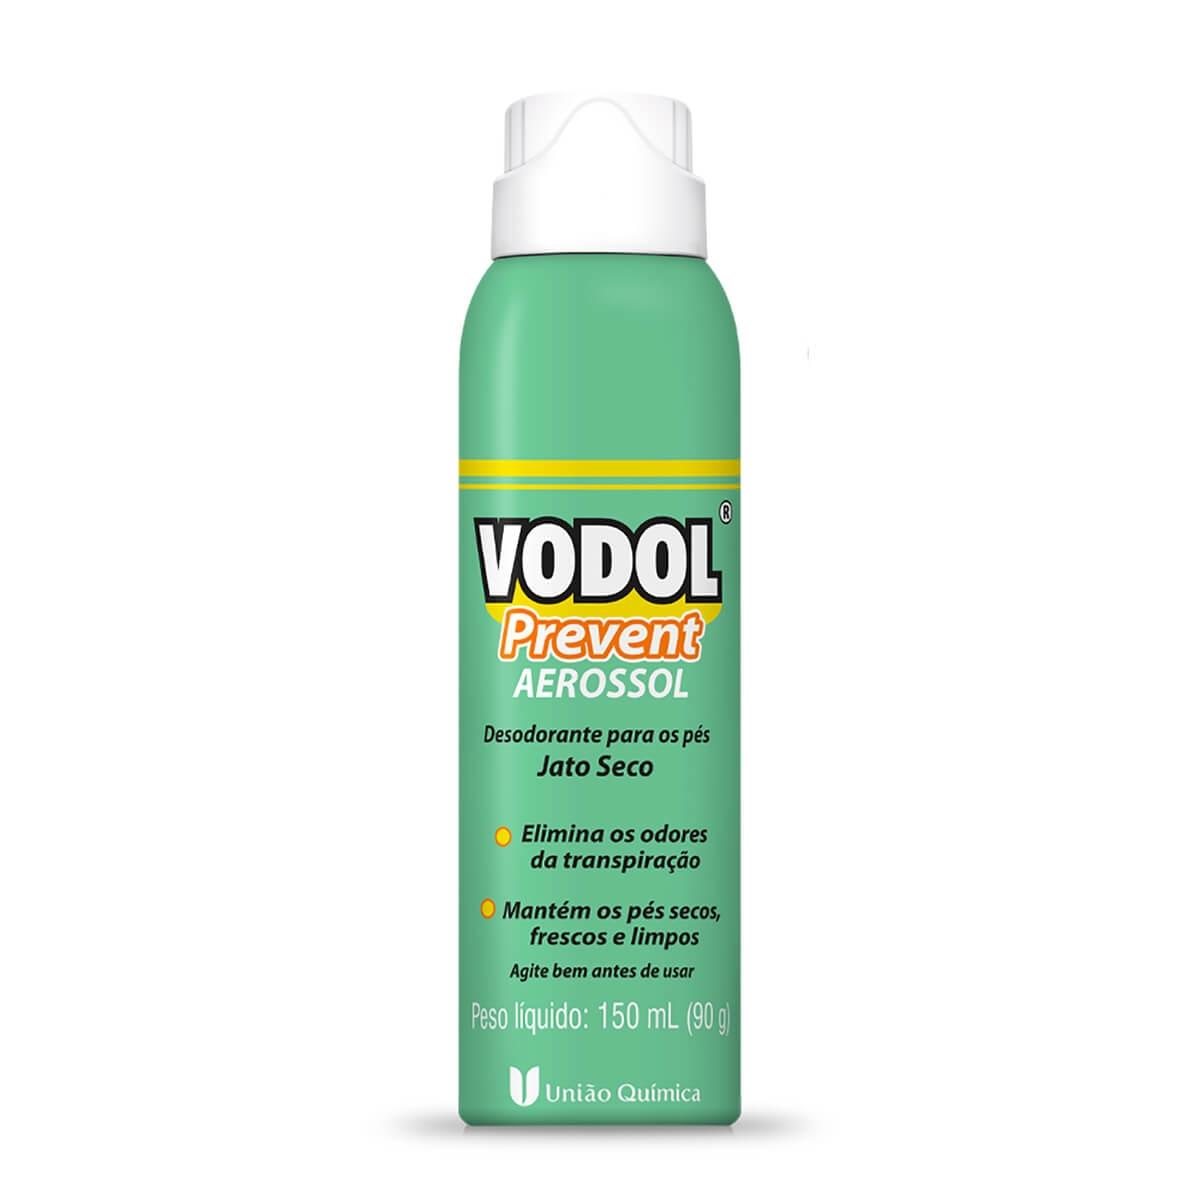 Desodorante Aerosol para os Pés Vodol Prevent 150ml 150ml Aerossol